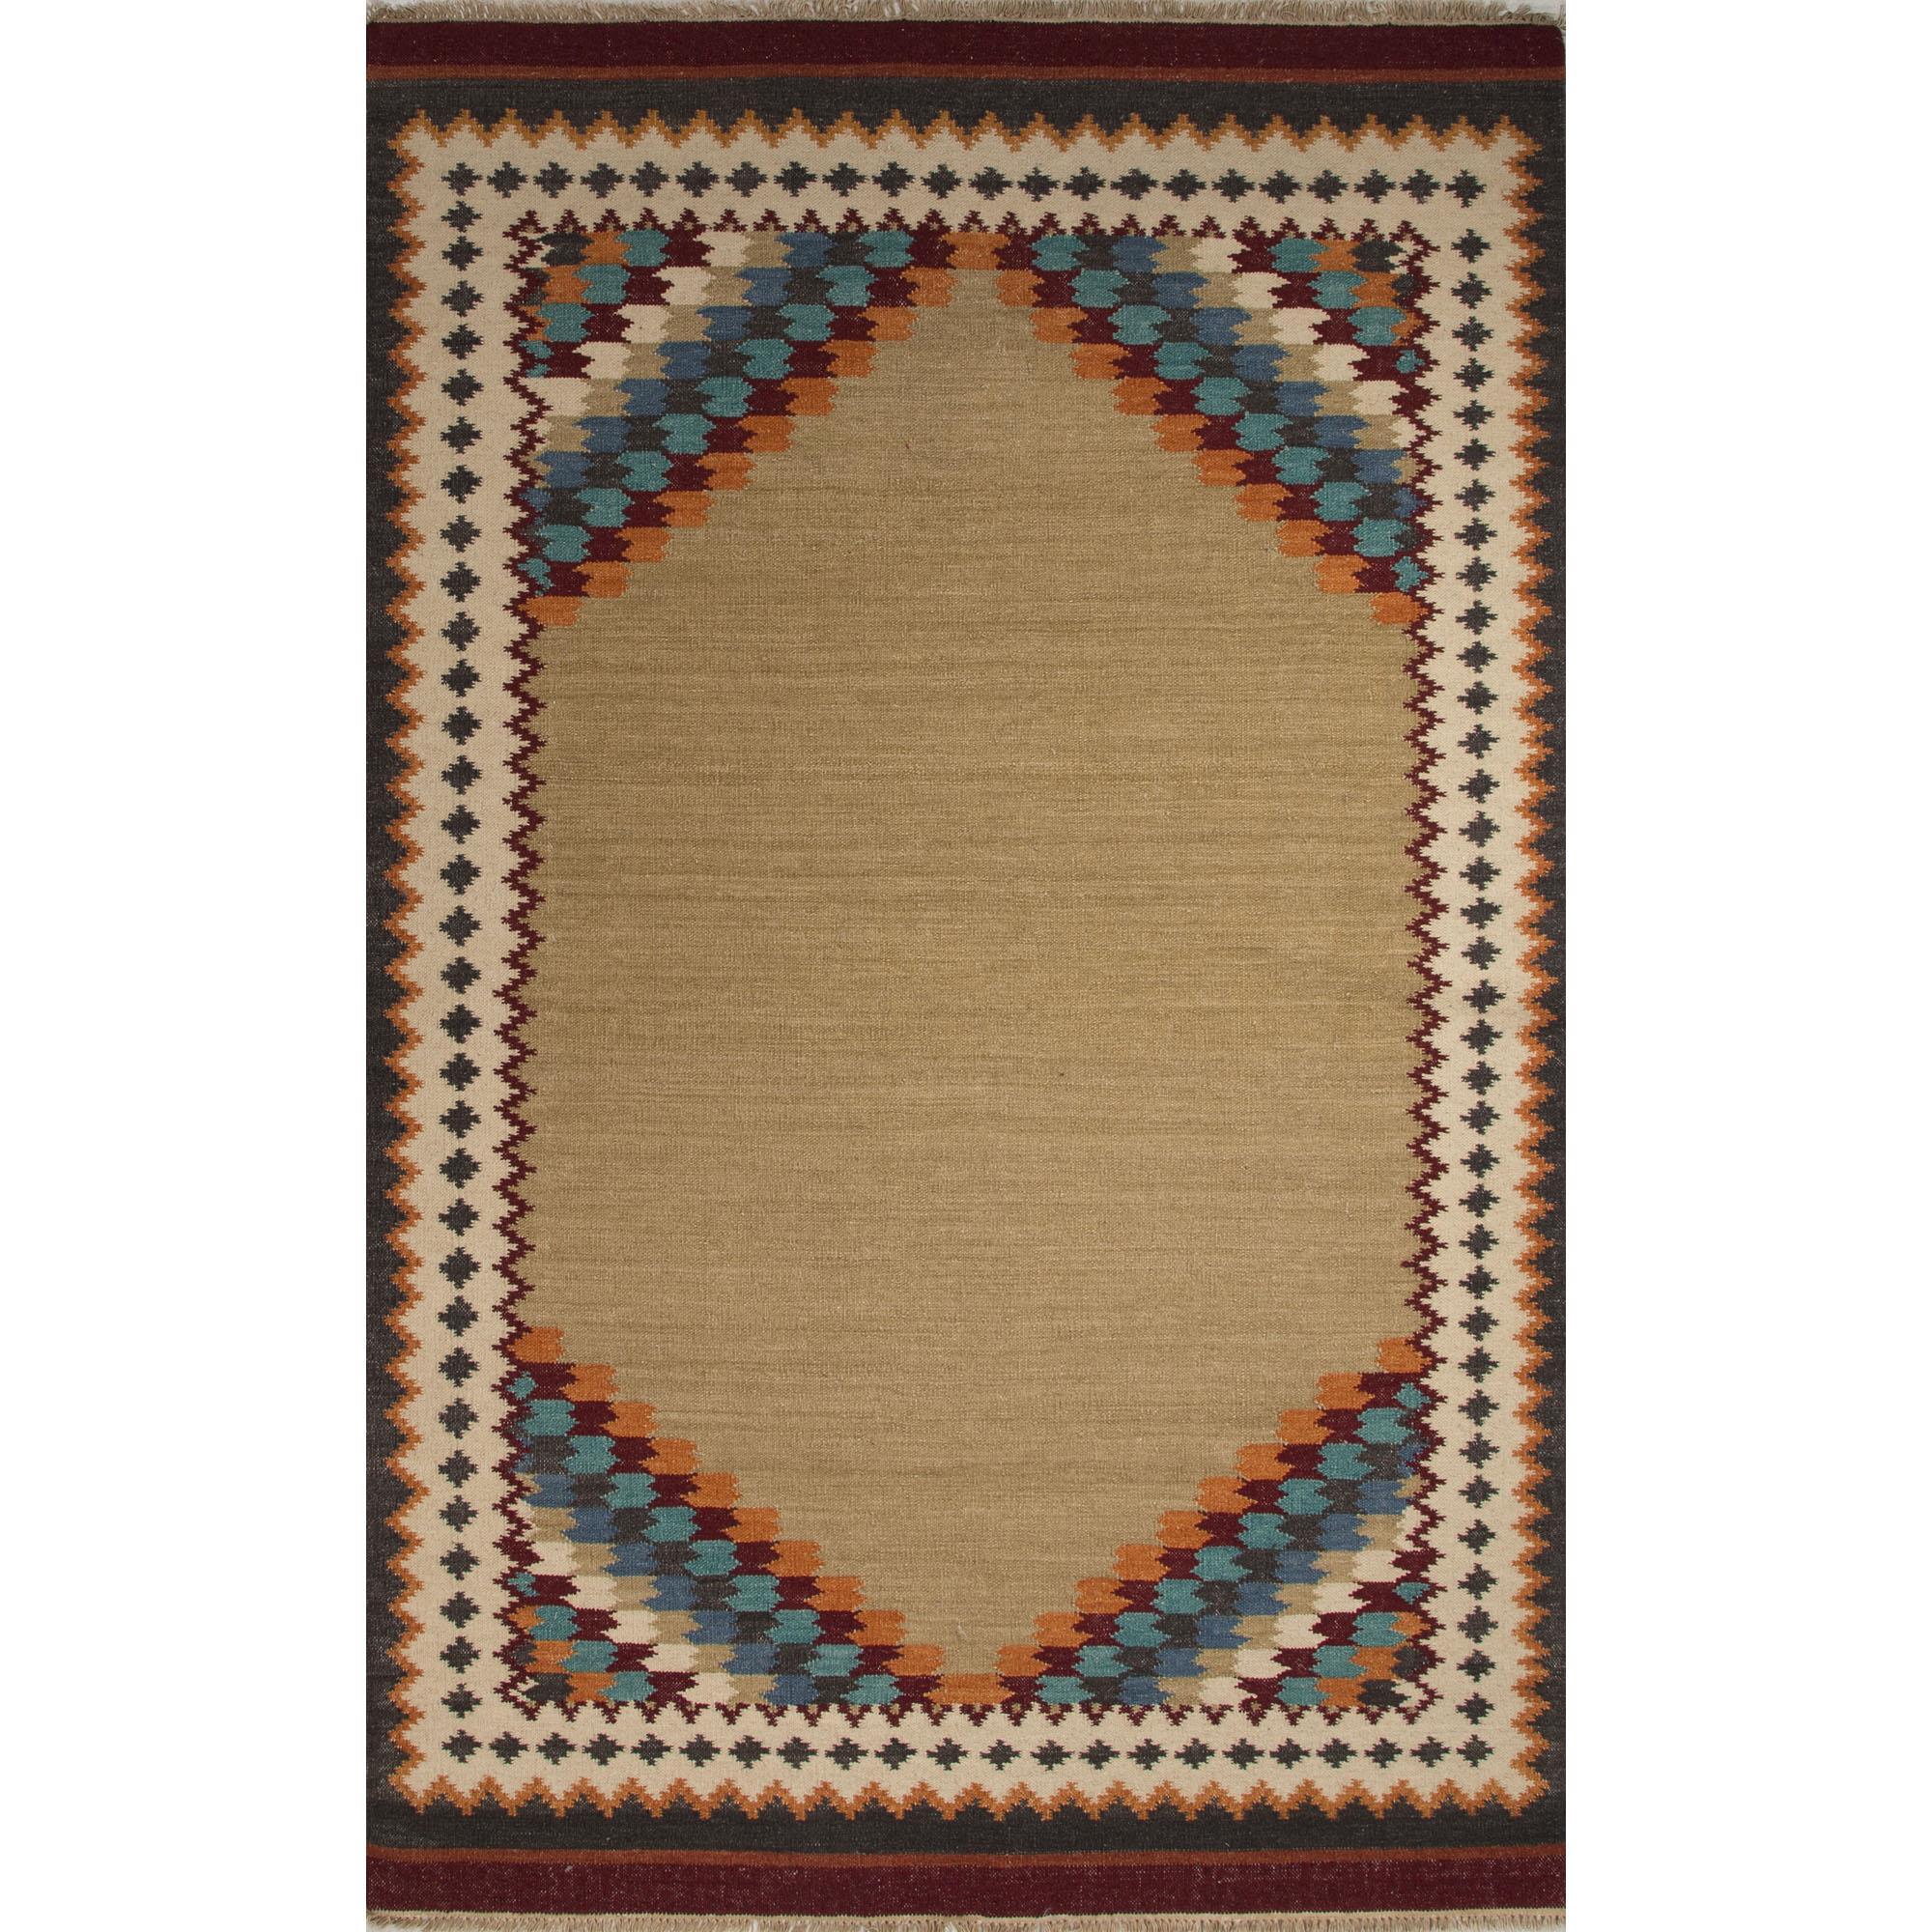 Anatolia 8 x 10 Rug by JAIPUR Living at Sprintz Furniture